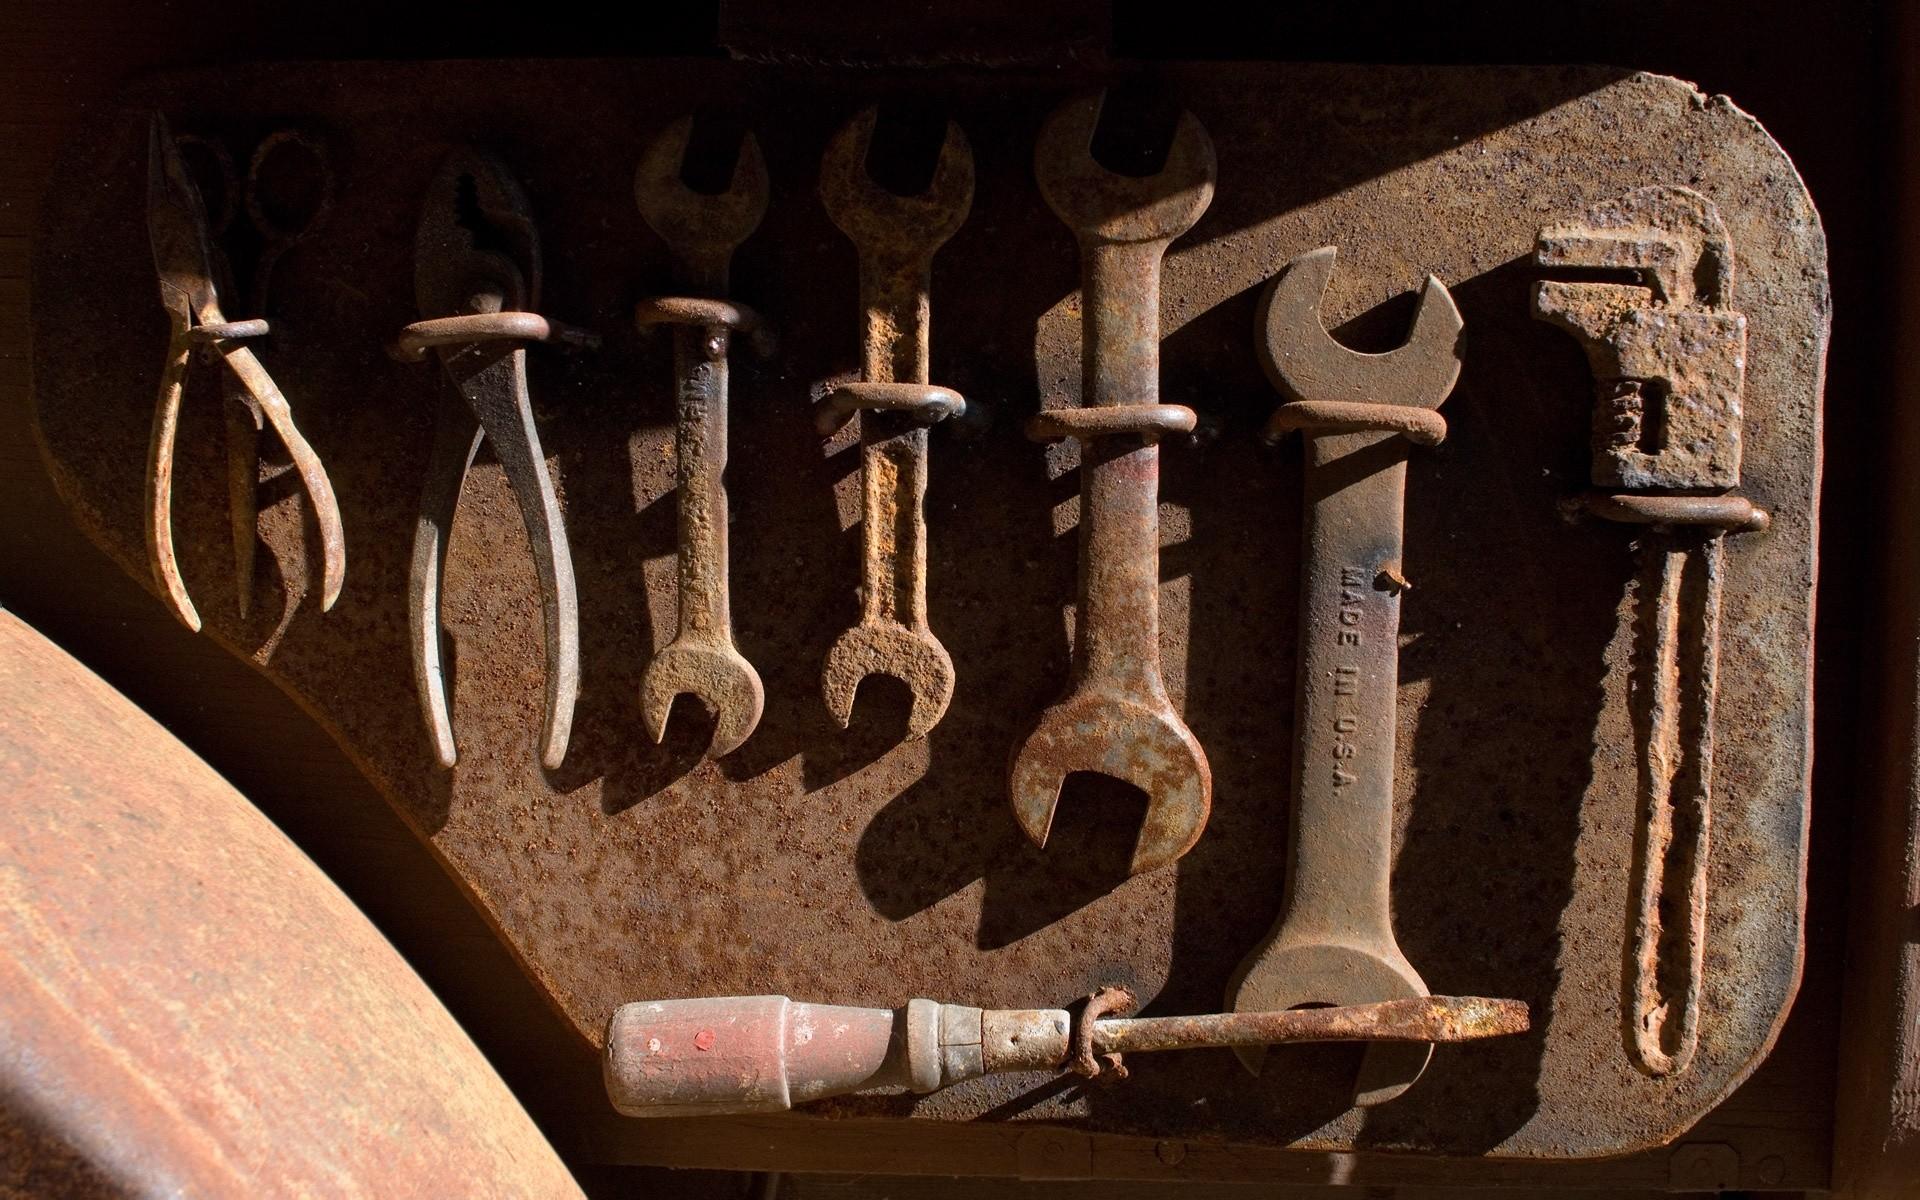 Tools Hd Wallpaper Background Image 1920x1200 Id